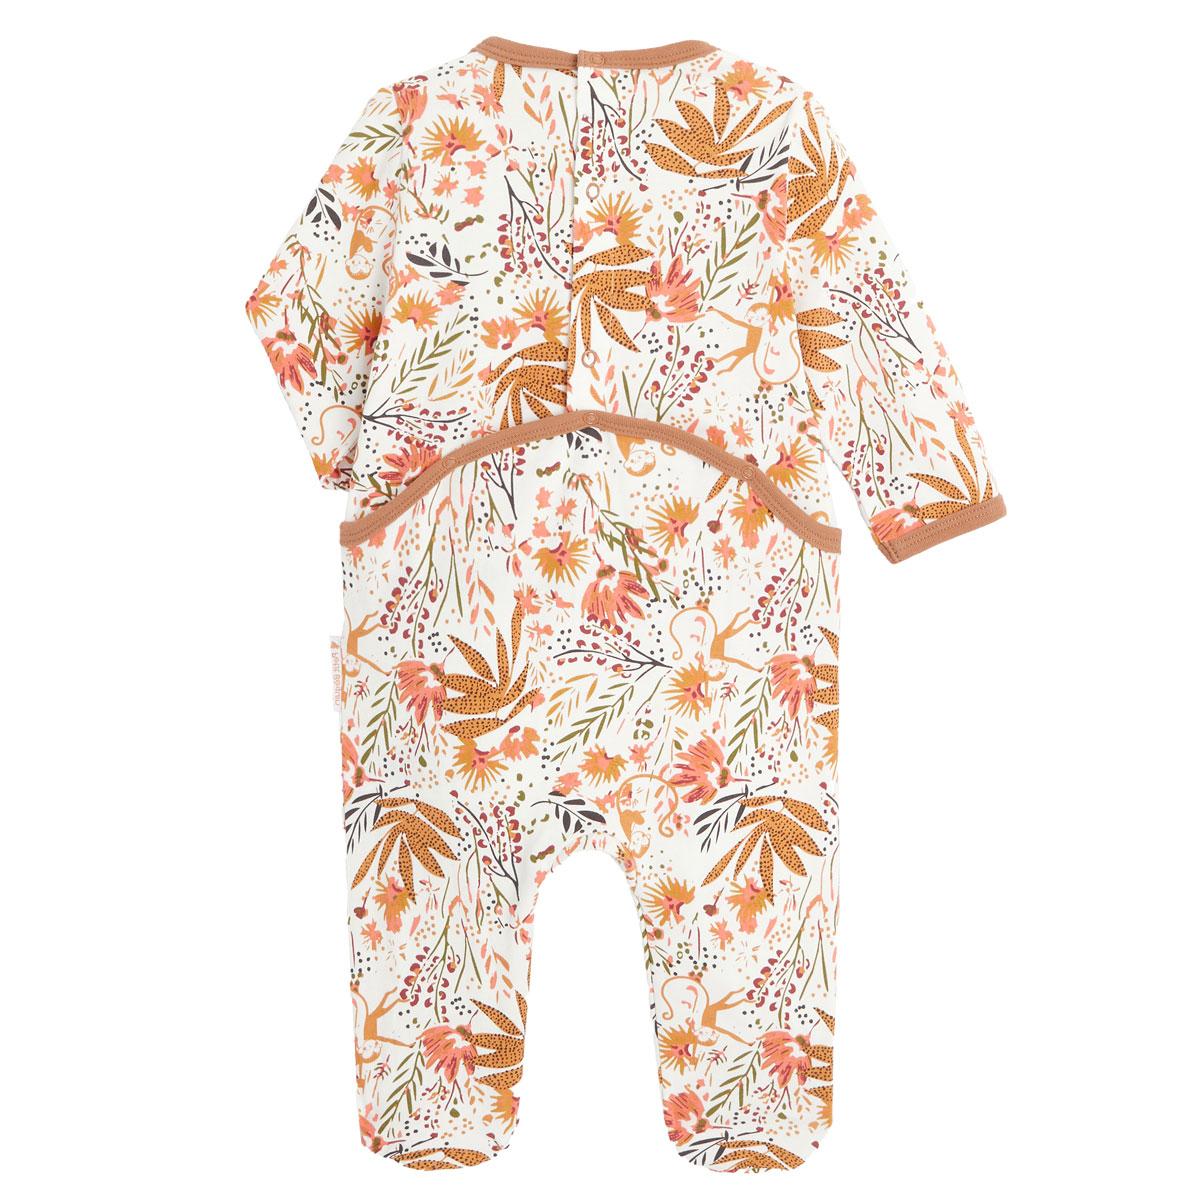 Pyjama bébé contenant du coton bio Copa Banana dos